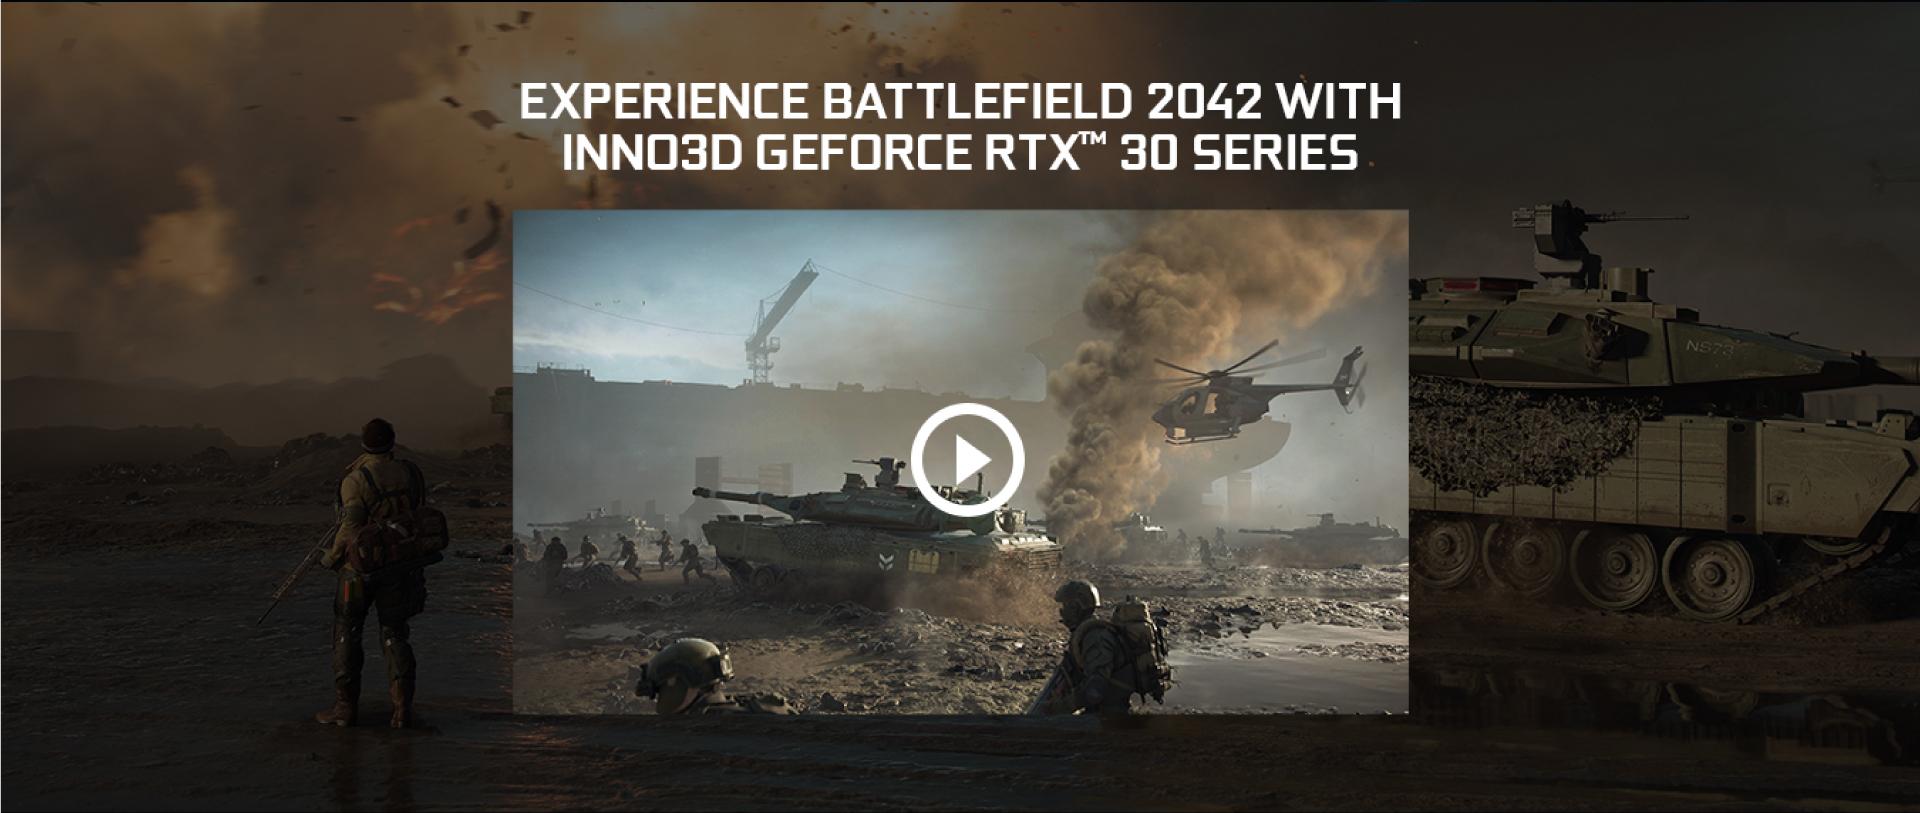 LP_geforce-rtx-battlefield2042-bundle_1920w_03.jpg (713 KB)